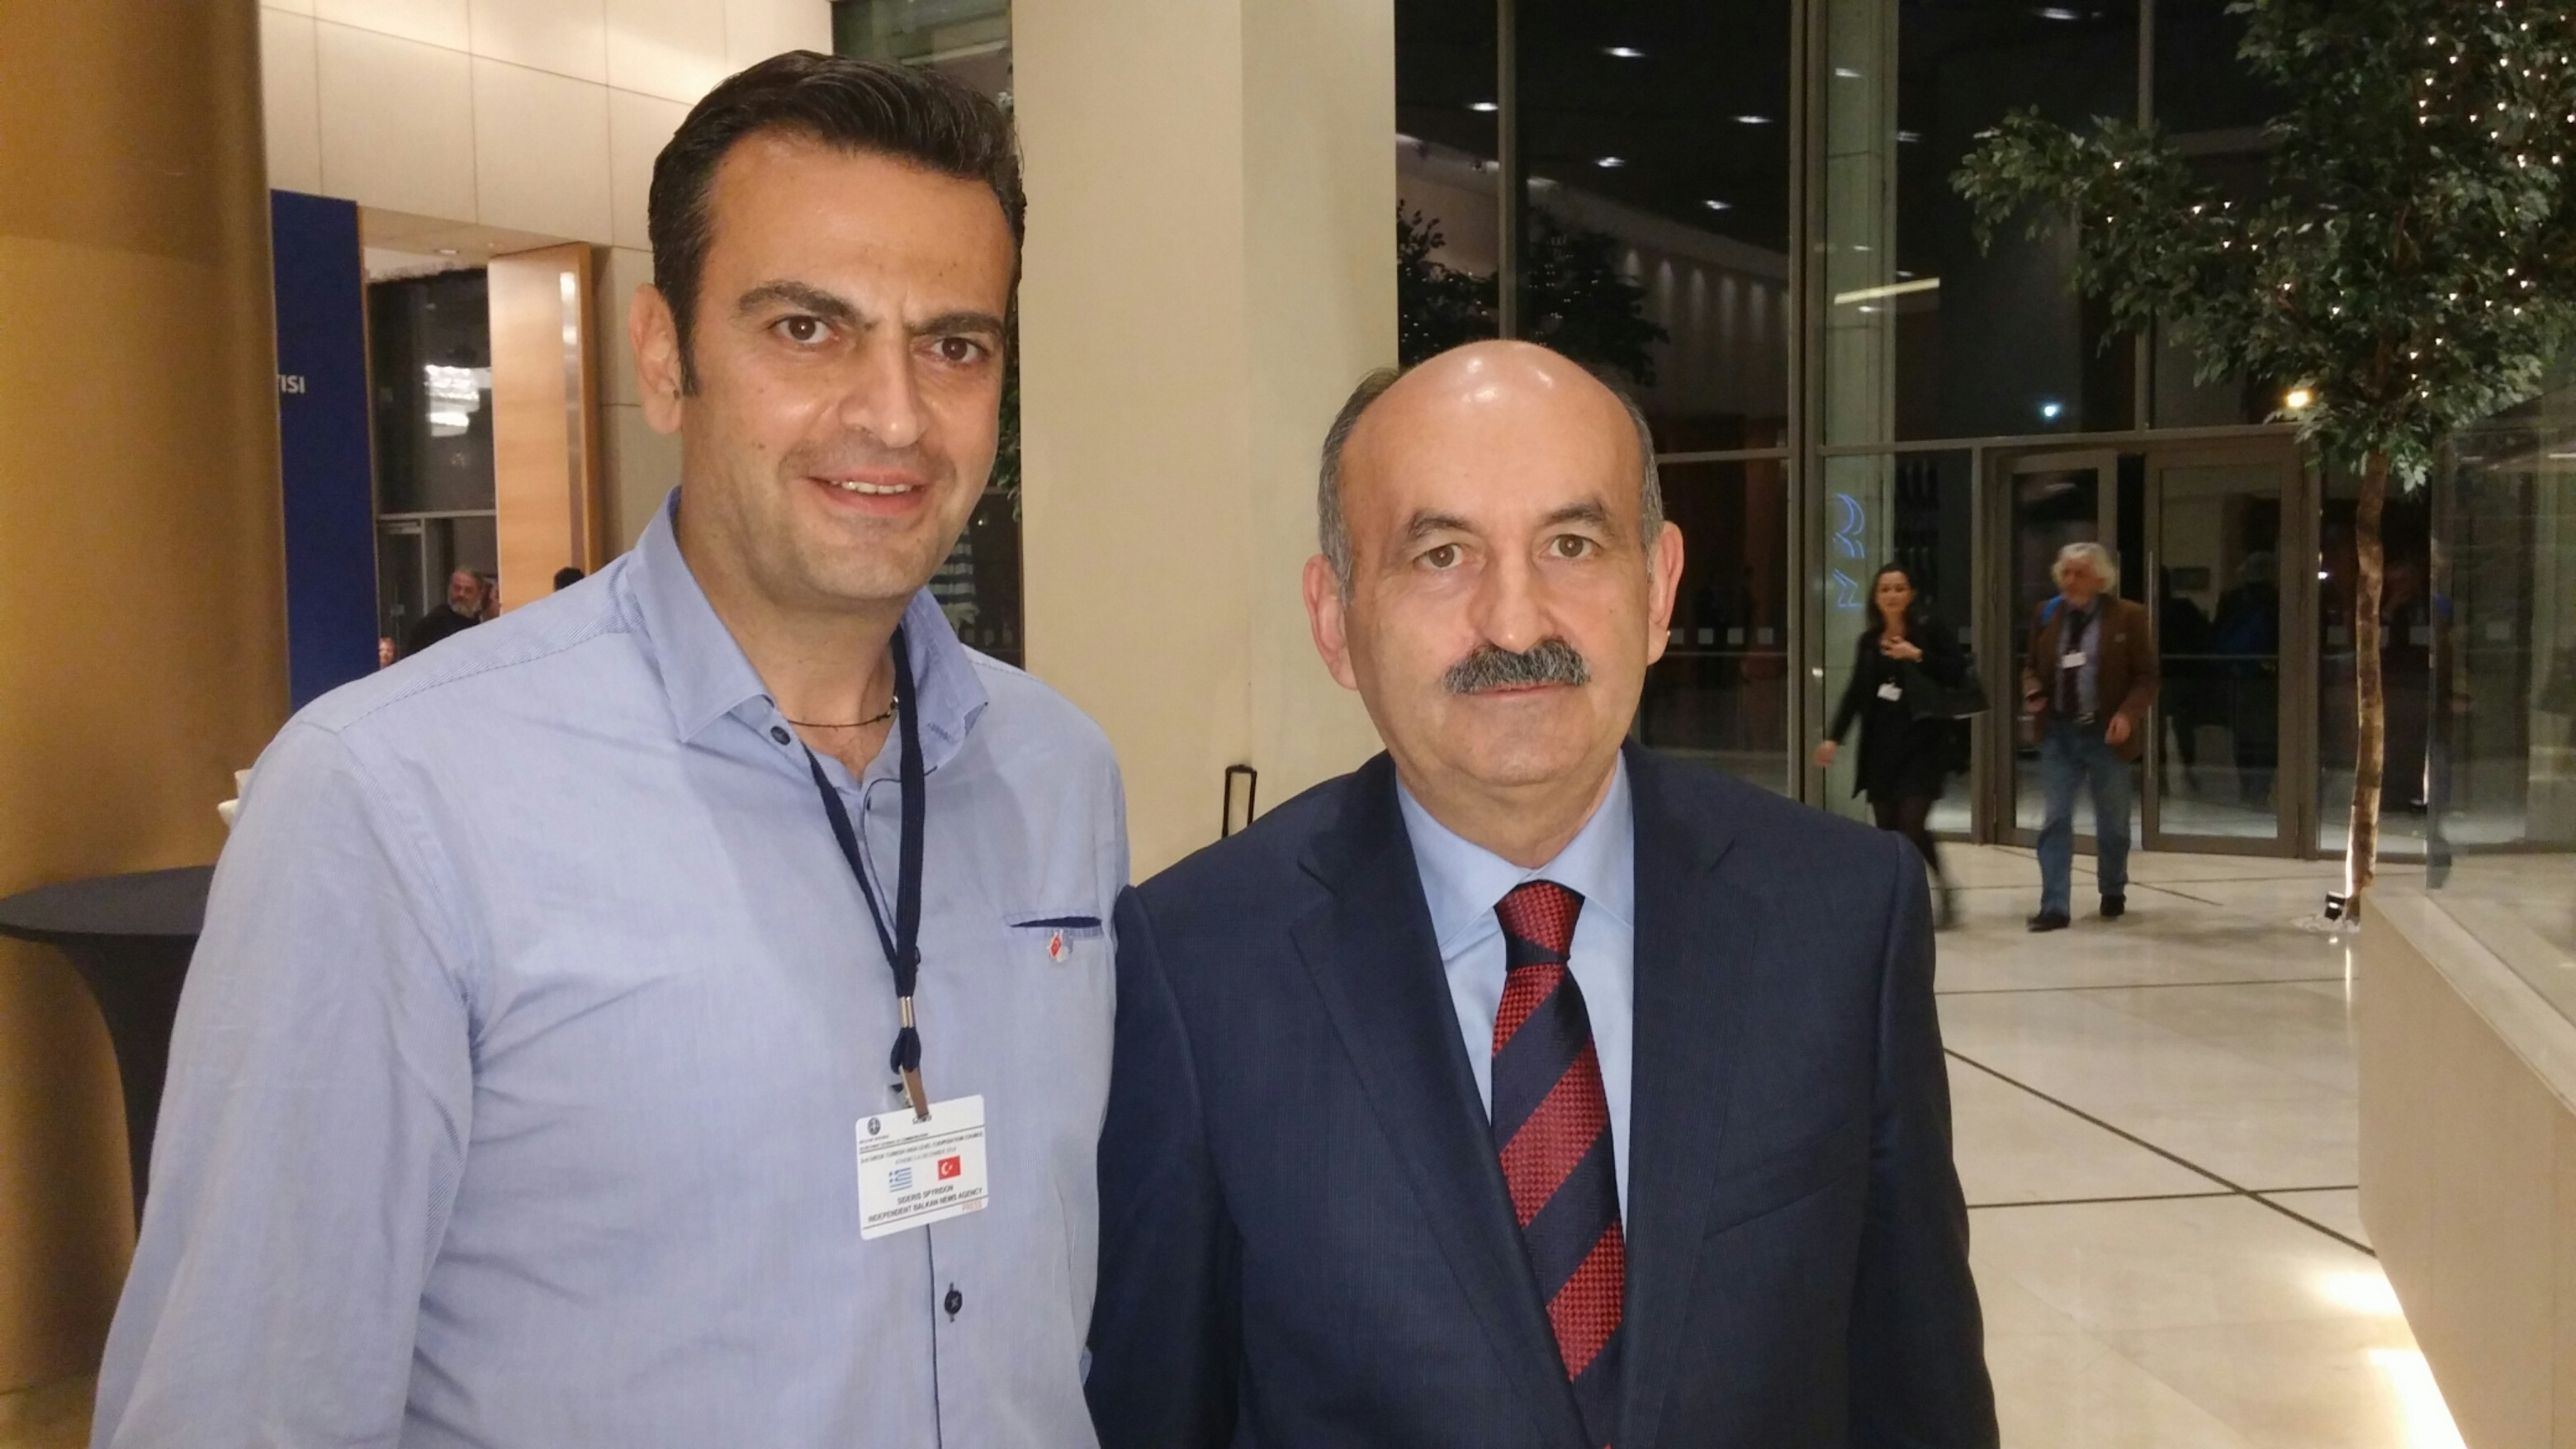 IBNA/Interview with Mehmet Müezzinoğlu Turkish Health Minister